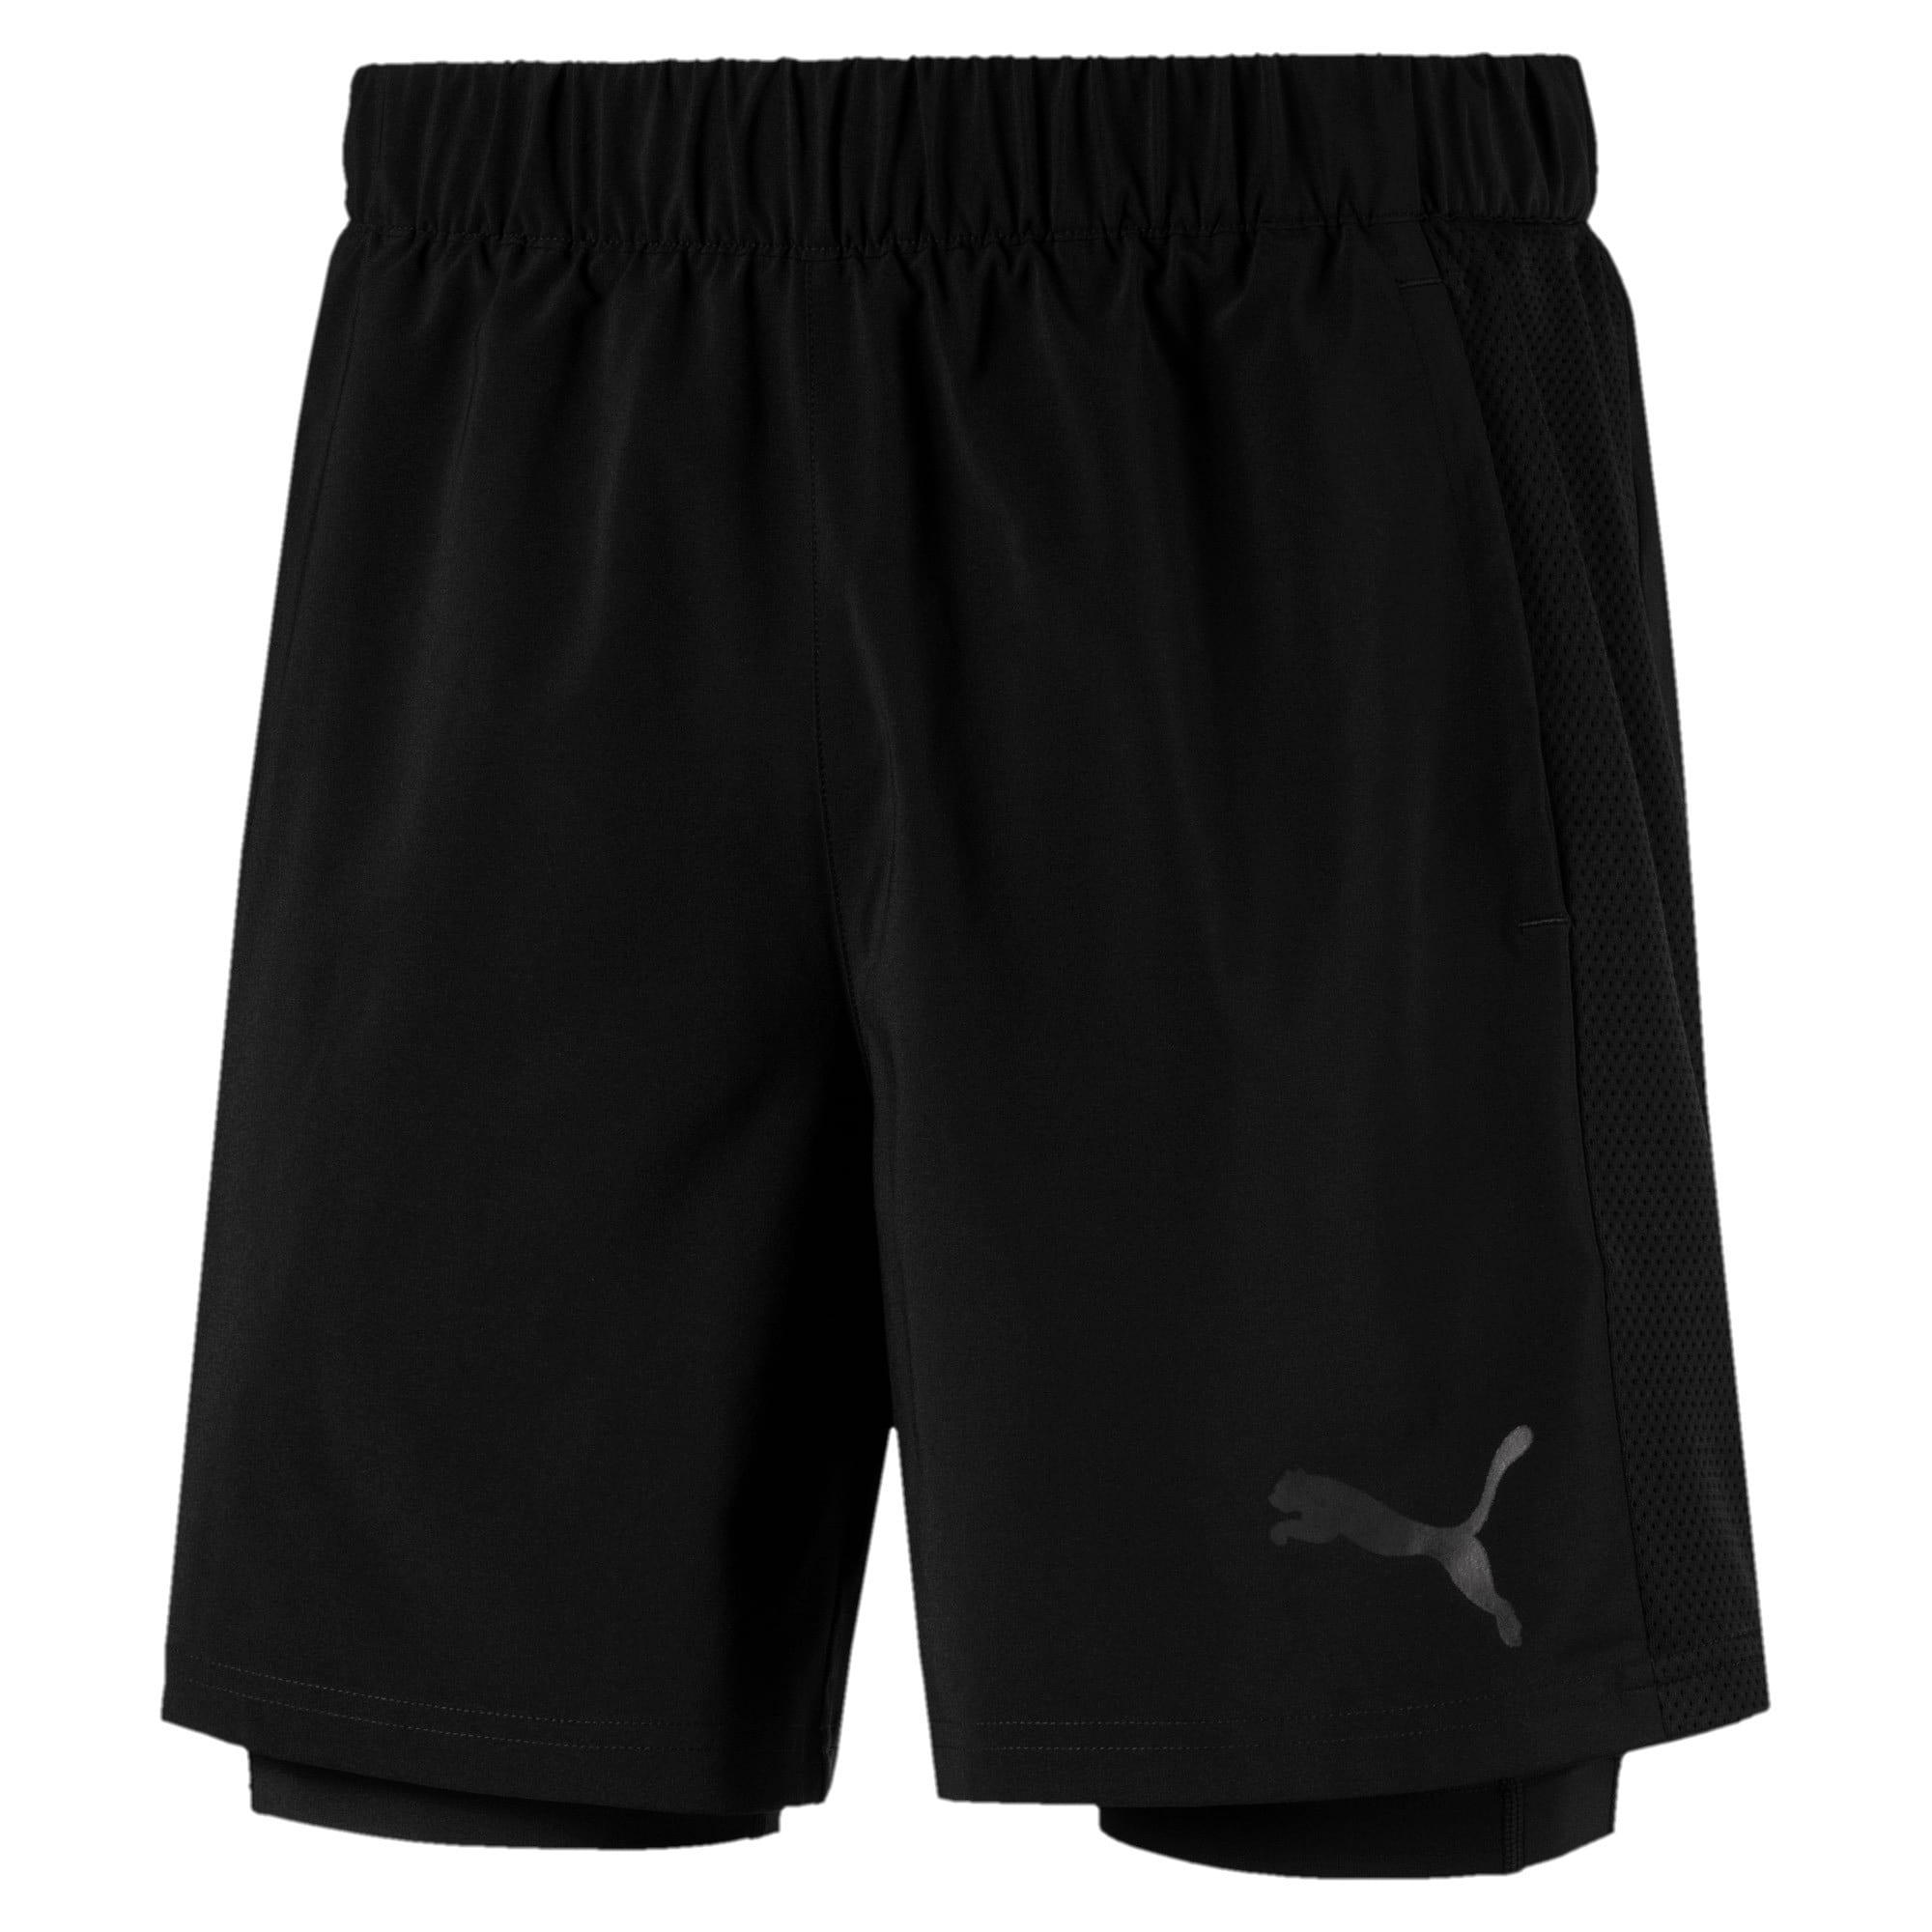 Thumbnail 1 of TECH Woven 2 in 1 Men's Training Shorts, Puma Black-Puma Black, medium-IND